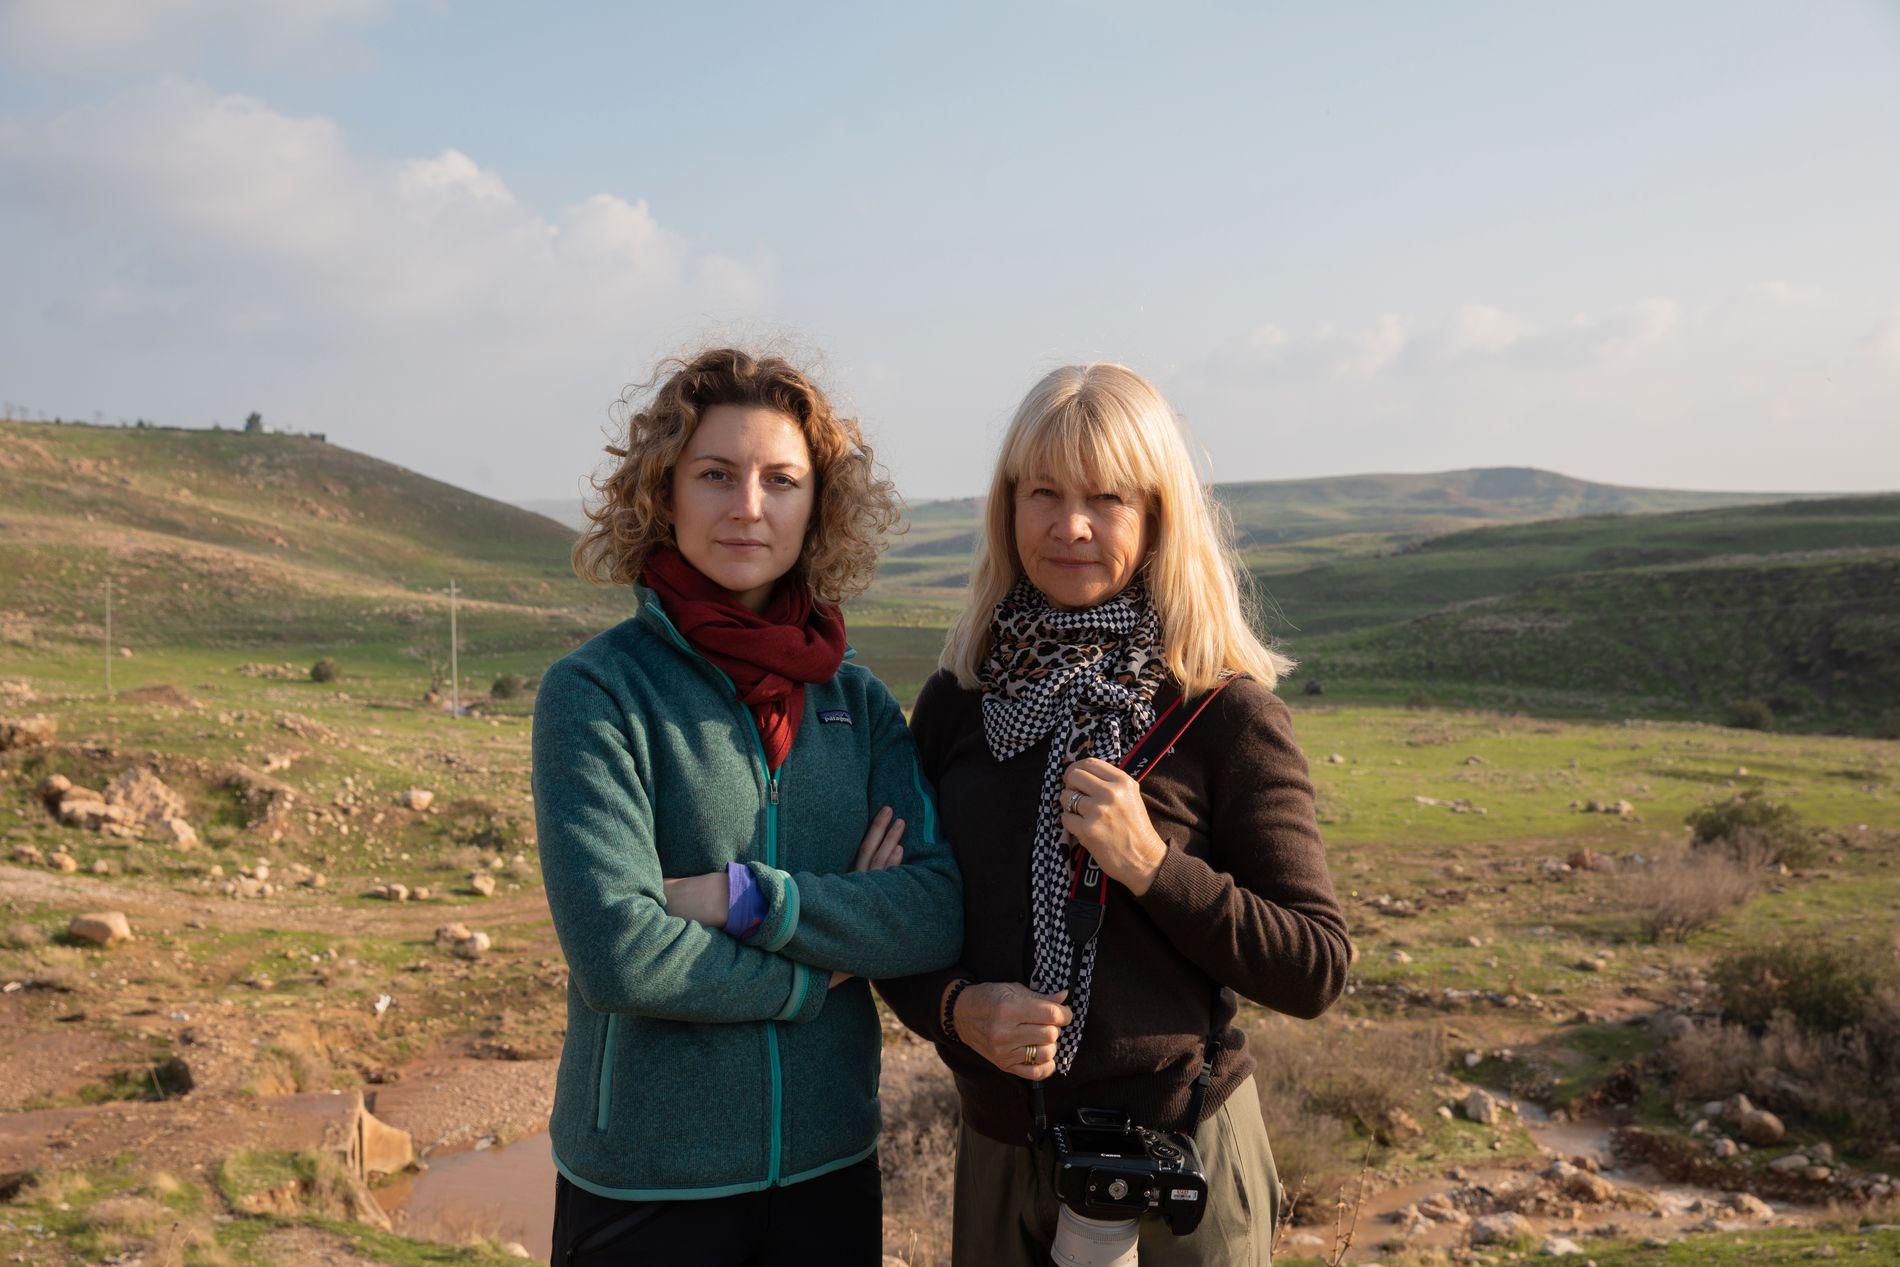 VG I IRAK/KURDISTAN: Midtøsten-korrespondent Ingeborg Huse Amundsen og fotograf Janne Møller-Hansen.